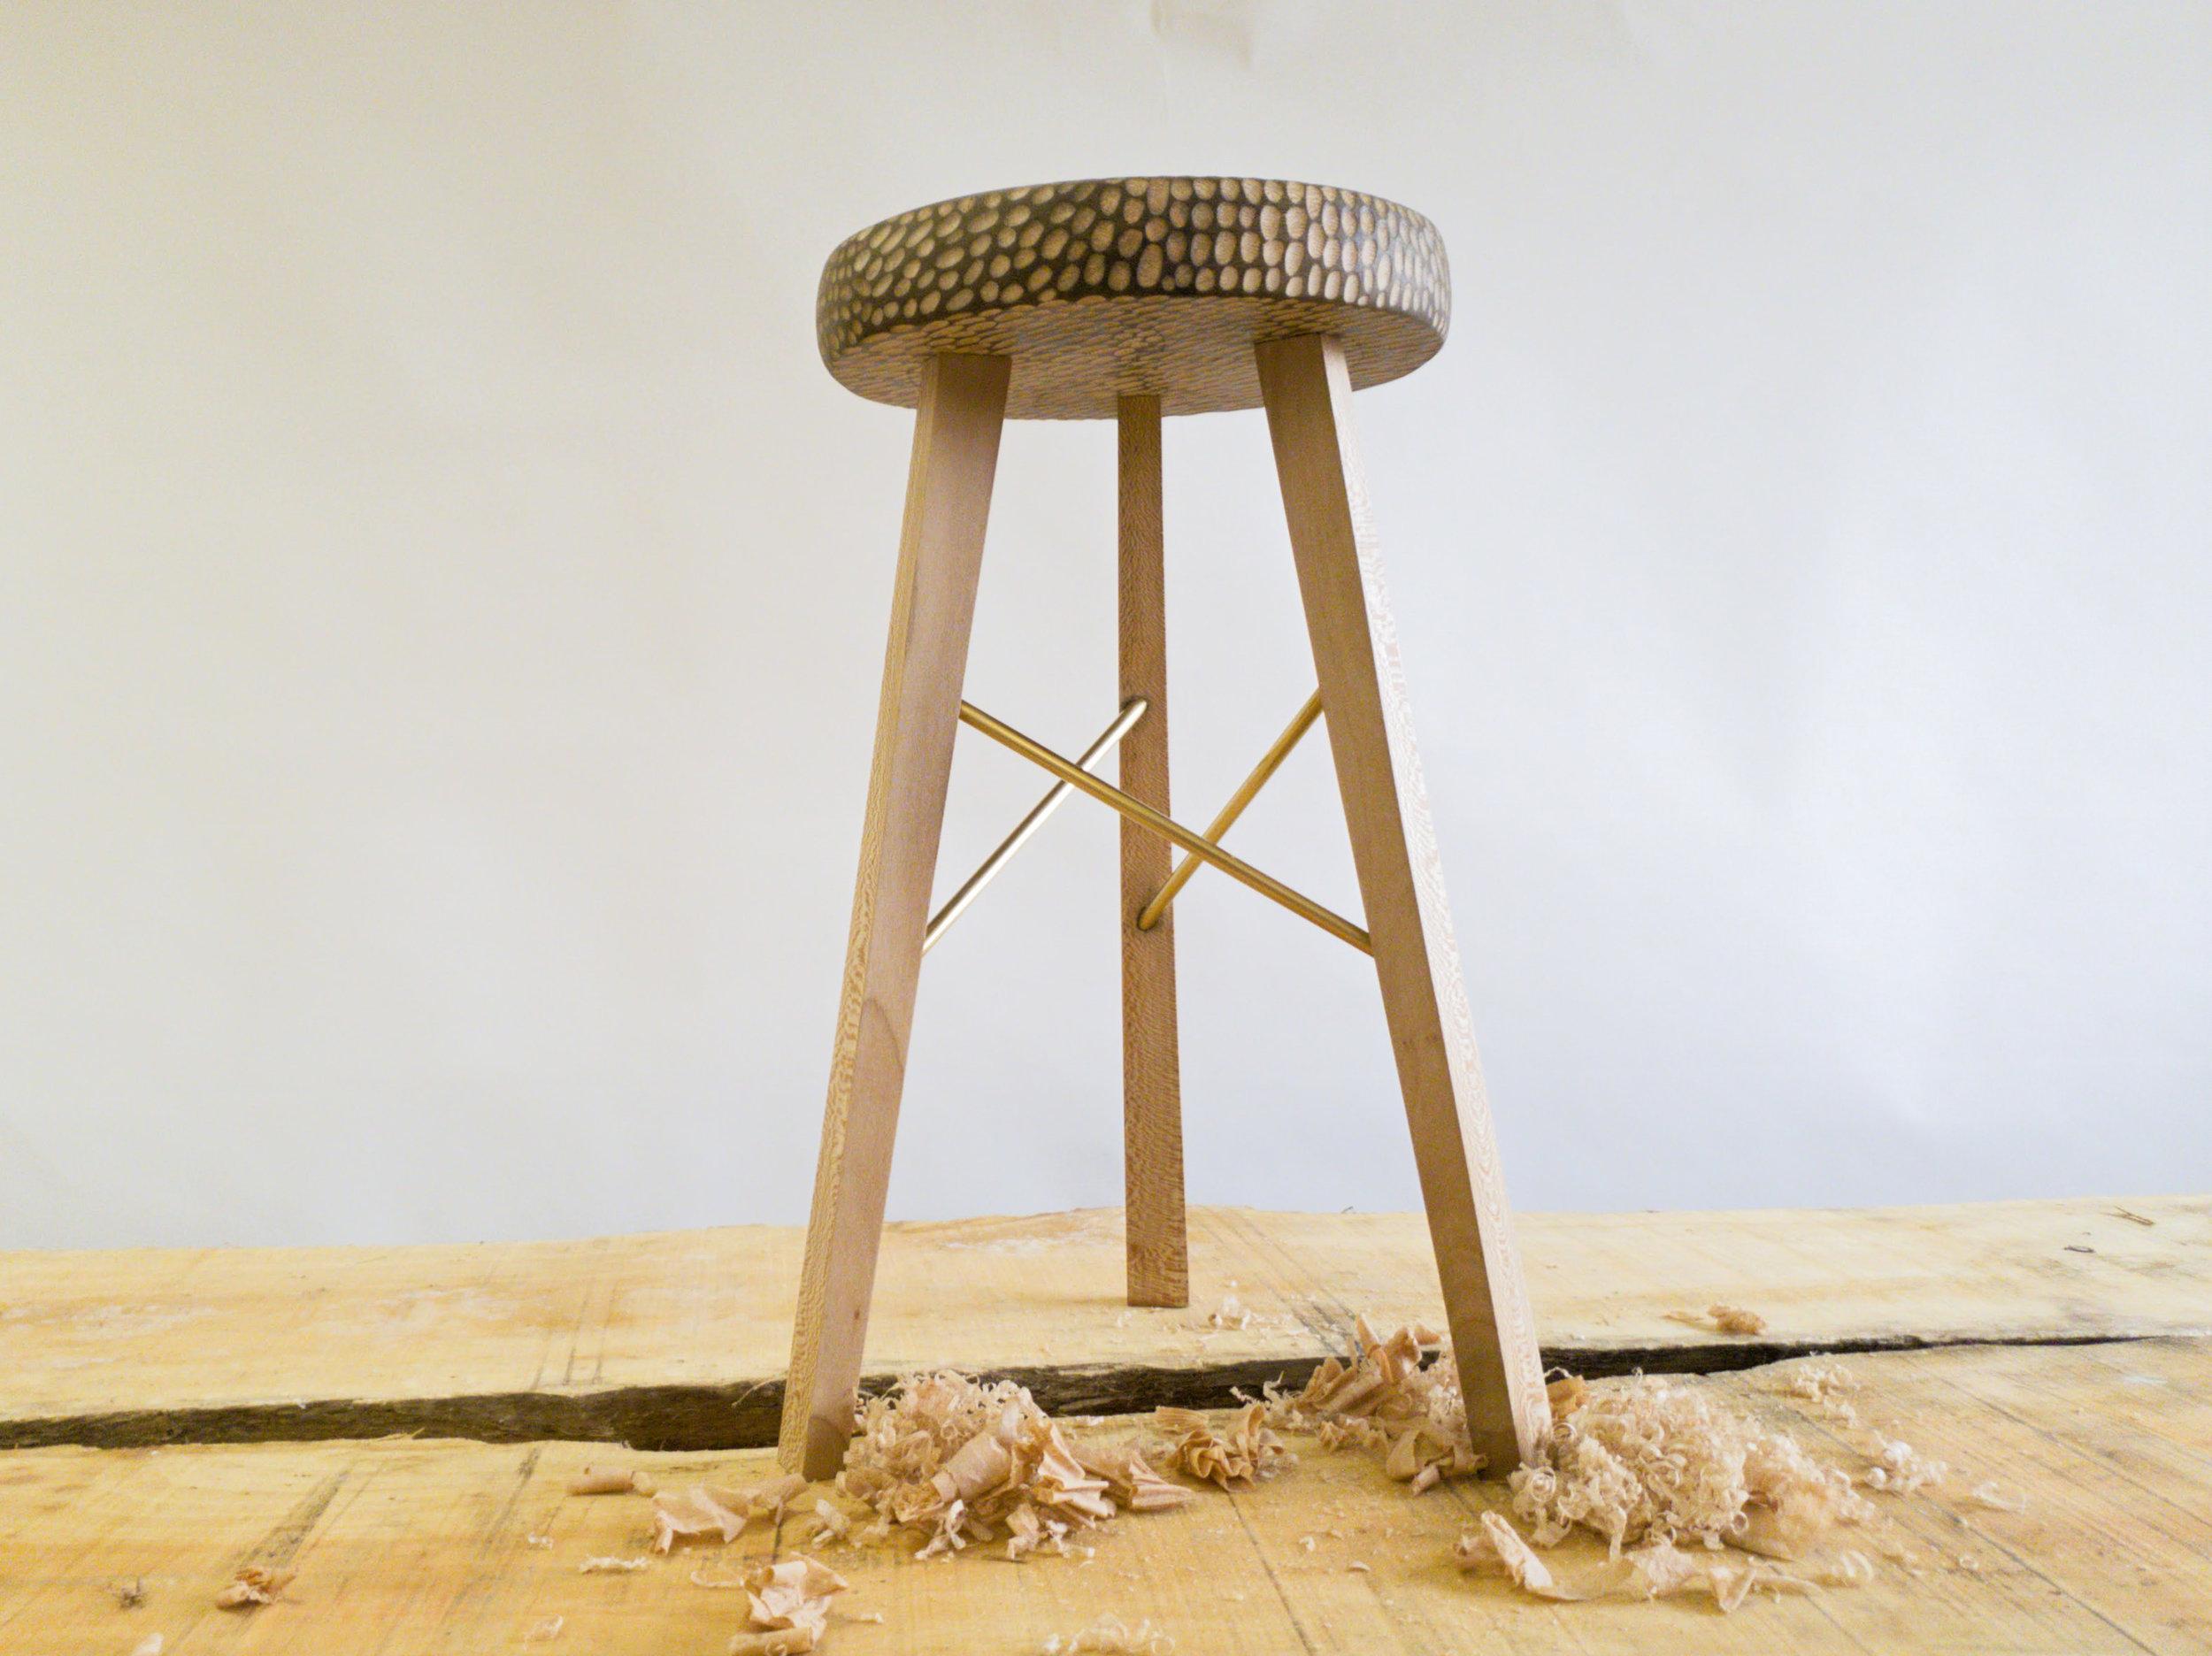 Heliconia_Furniture_Tripod_Stool (2).jpg